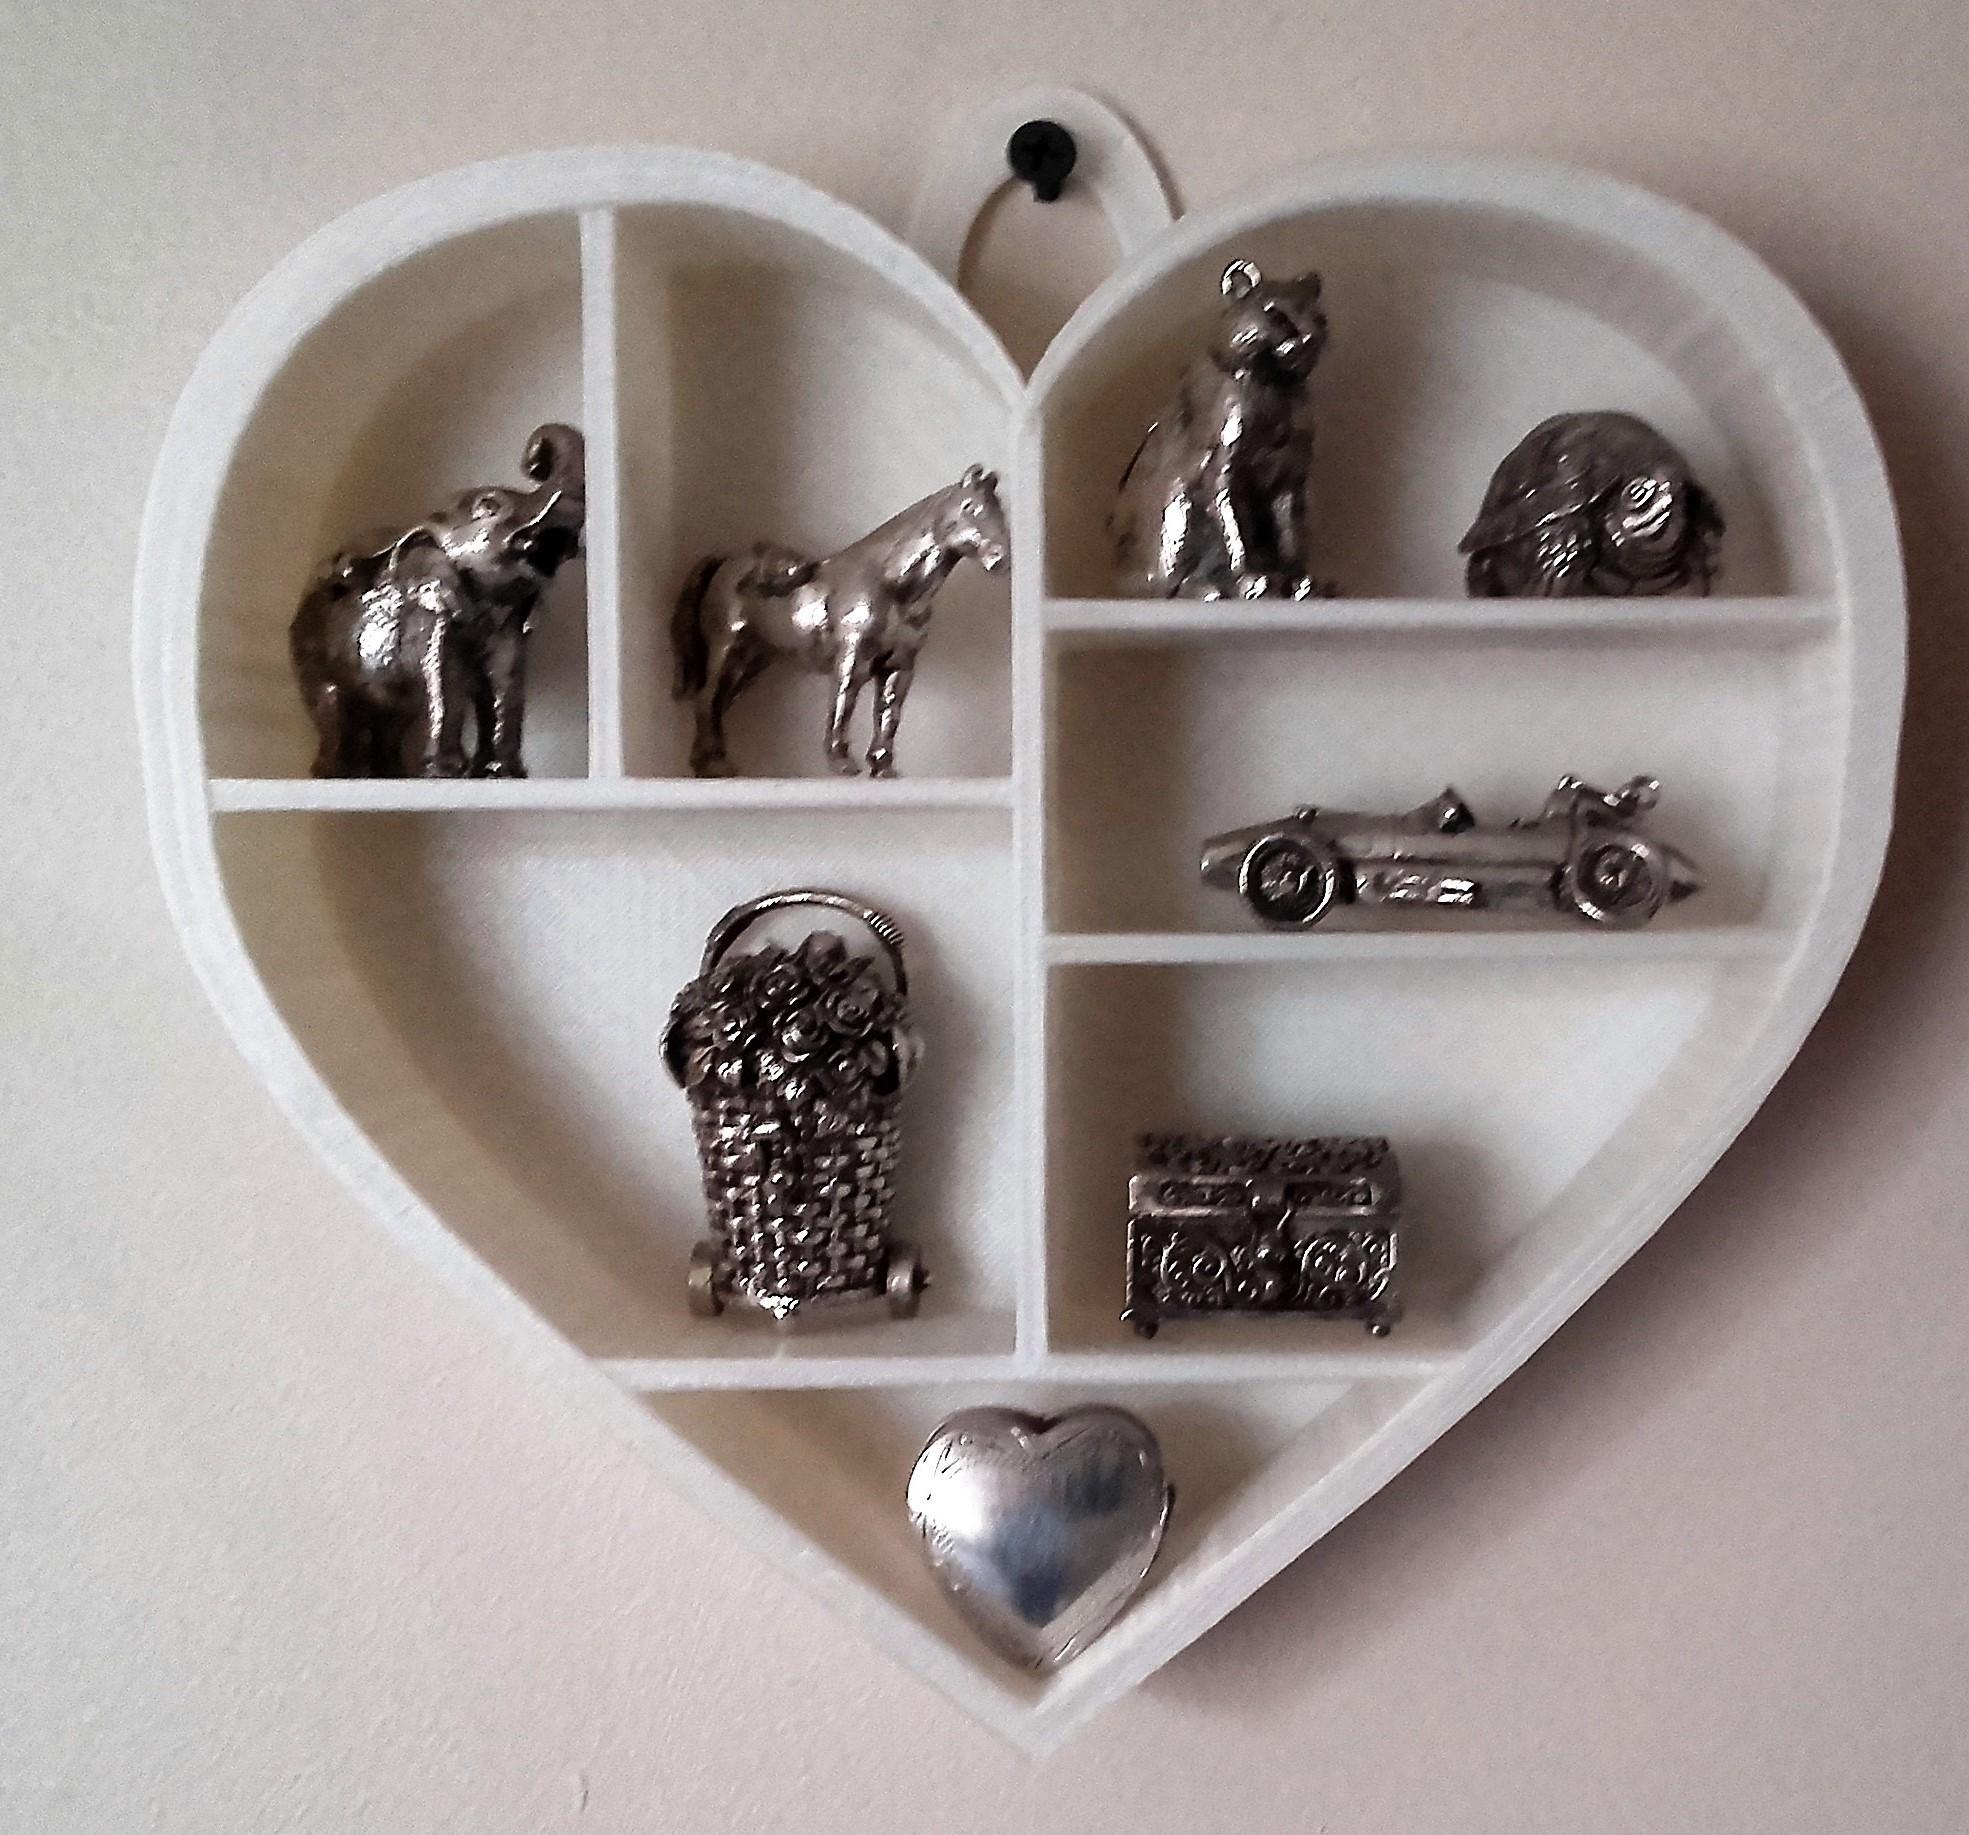 20170305_112722.jpg Download STL file Heart shelf • 3D printing model, catf3d